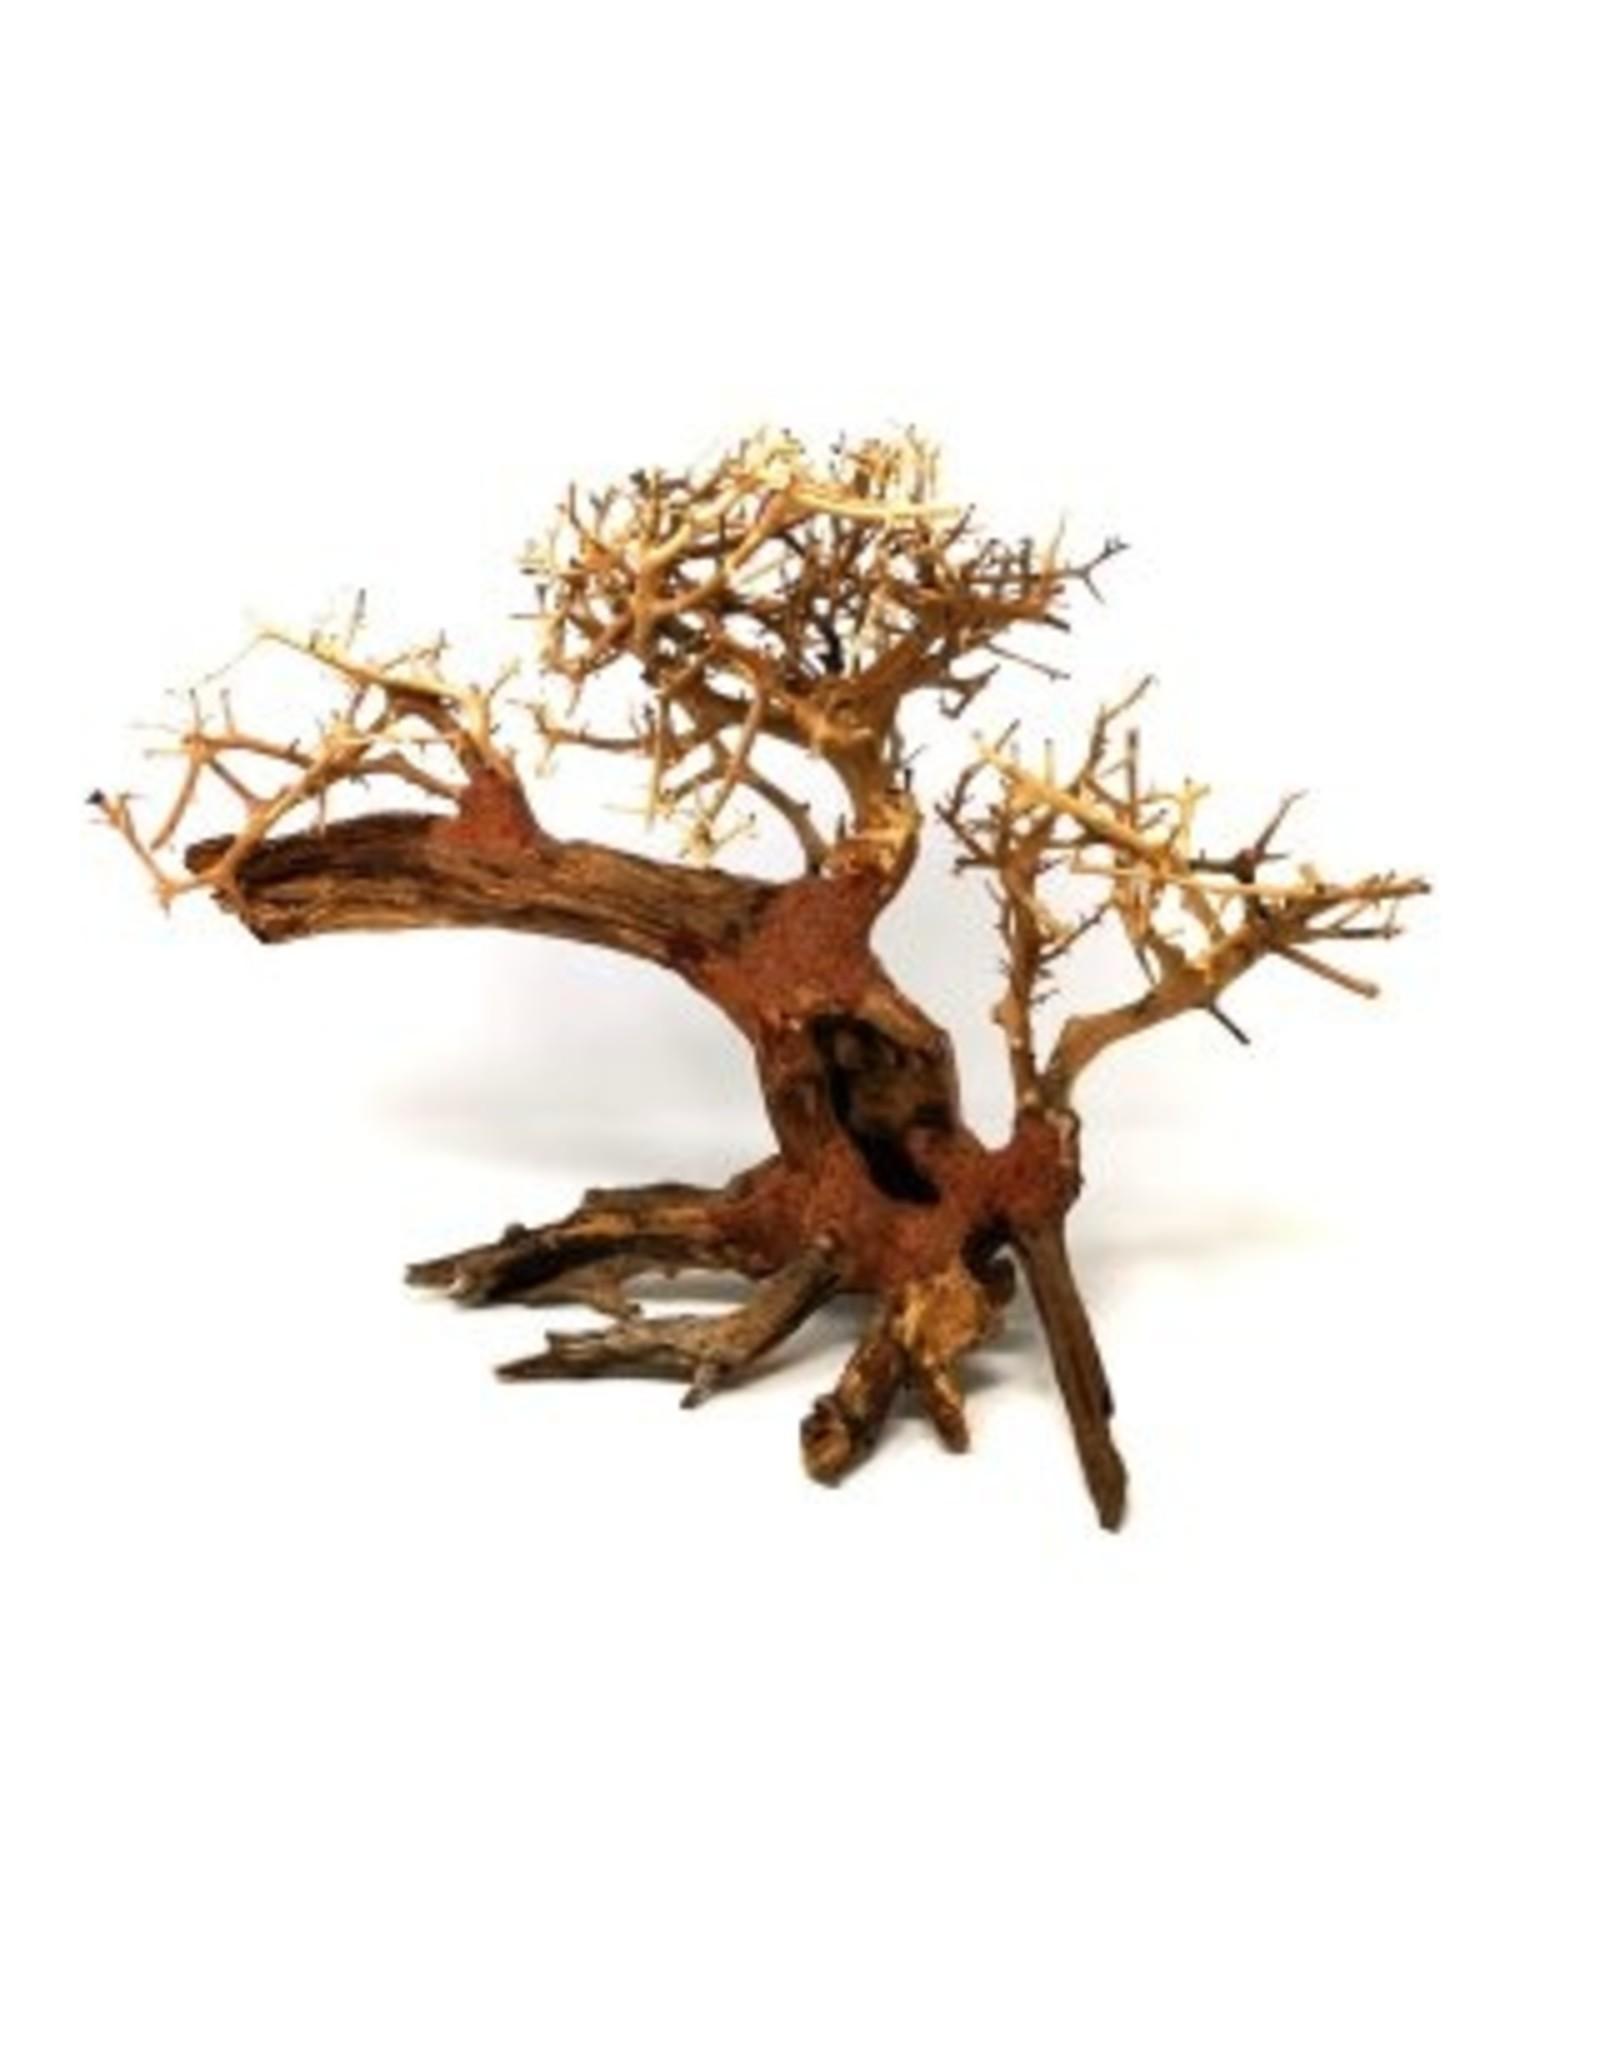 Aquaglobe Products AQUAGLOBE Dragon Wood